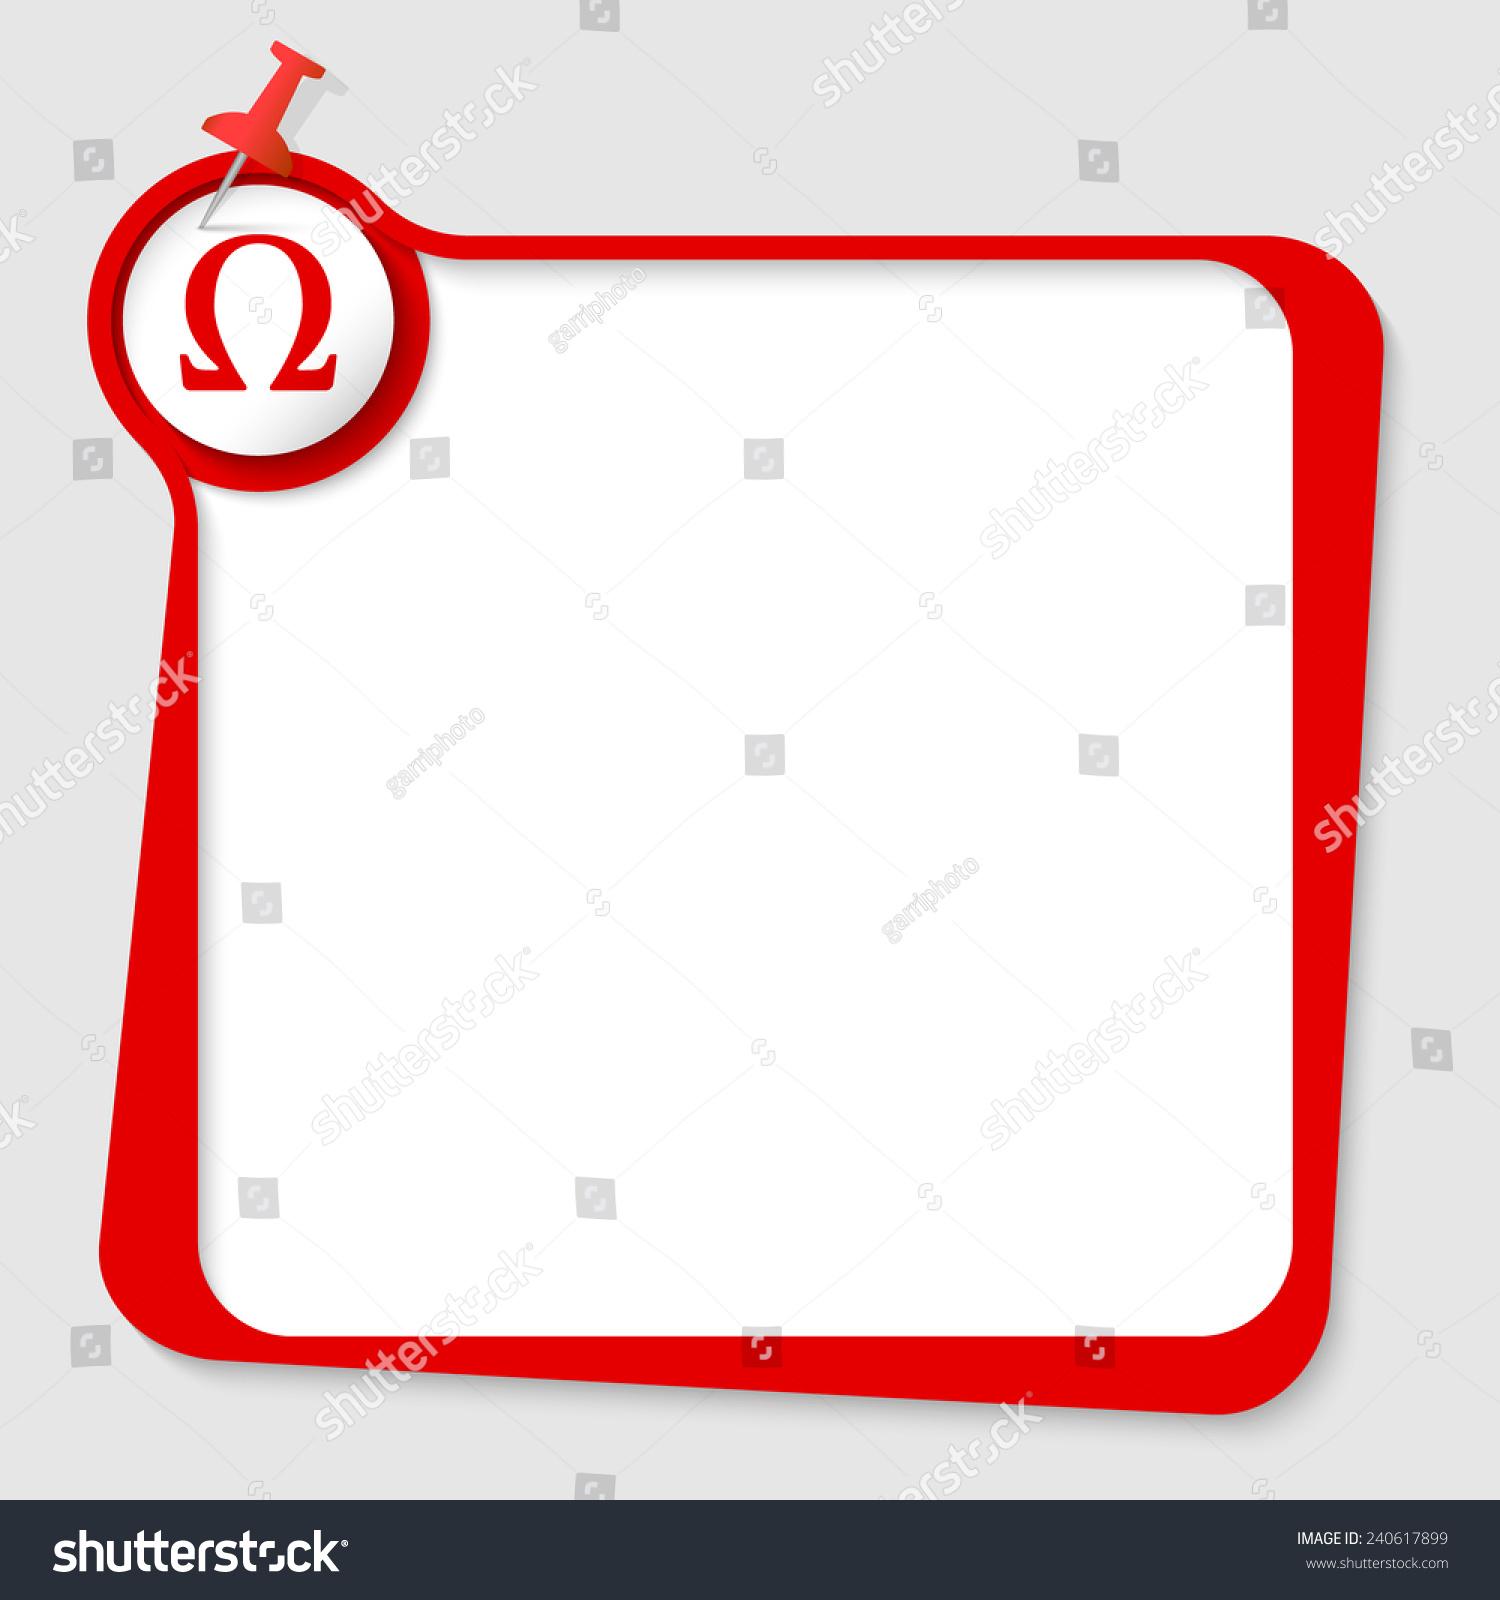 Text box pushpin omega symbol stock vector 240617899 shutterstock text box with pushpin and omega symbol buycottarizona